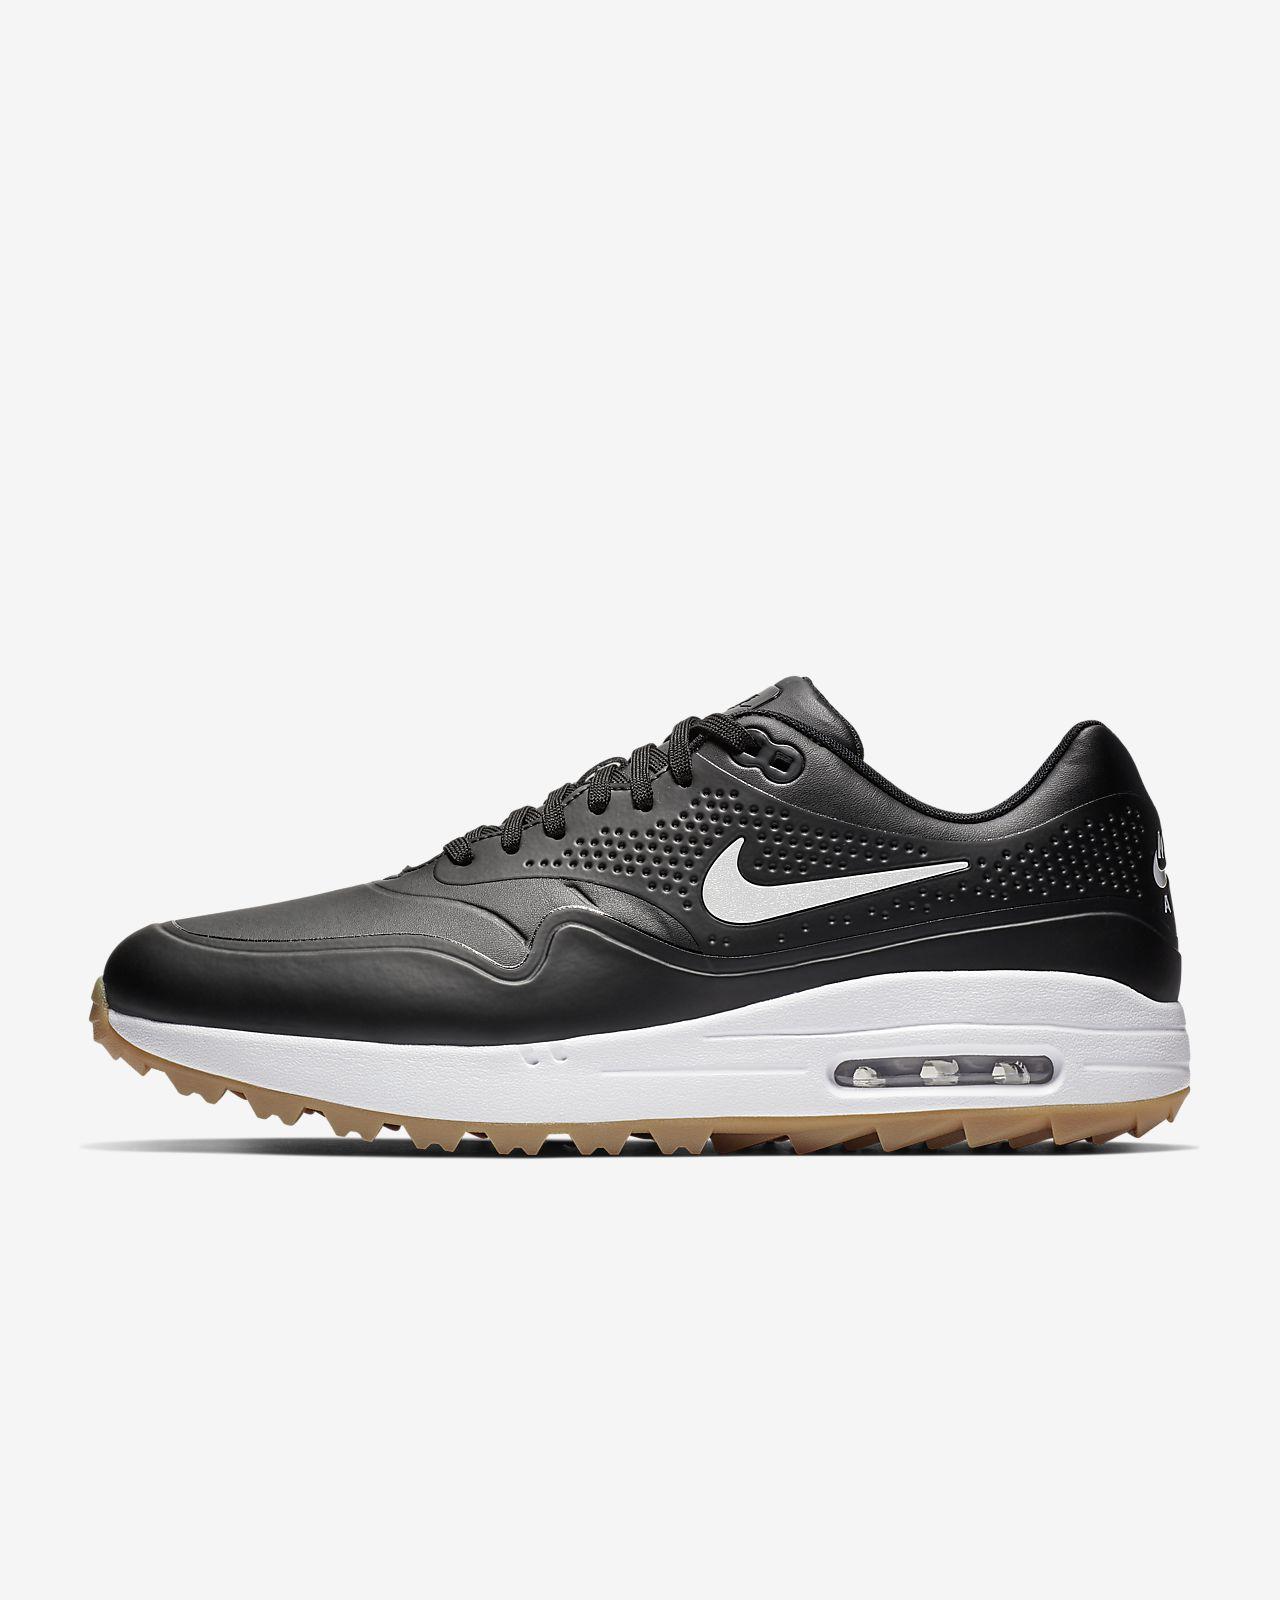 3422007754bb4 Nike Air Max 1g Mens Golf Shoe Nikecom Hu